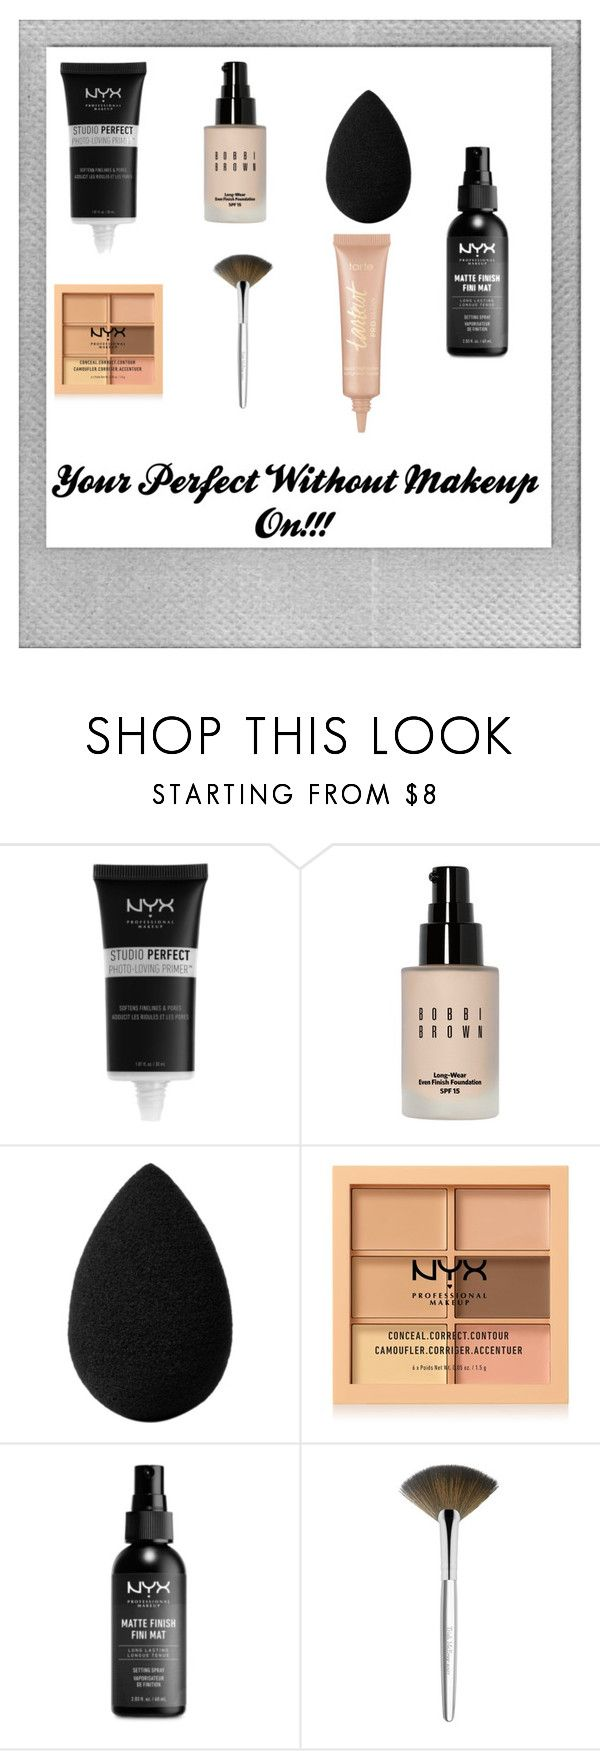 """Lazy Day Makeup"" by kiyakay7 ❤ liked on Polyvore featuring Polaroid, NYX, Bobbi Brown Cosmetics, beautyblender, Trish McEvoy and tarte"